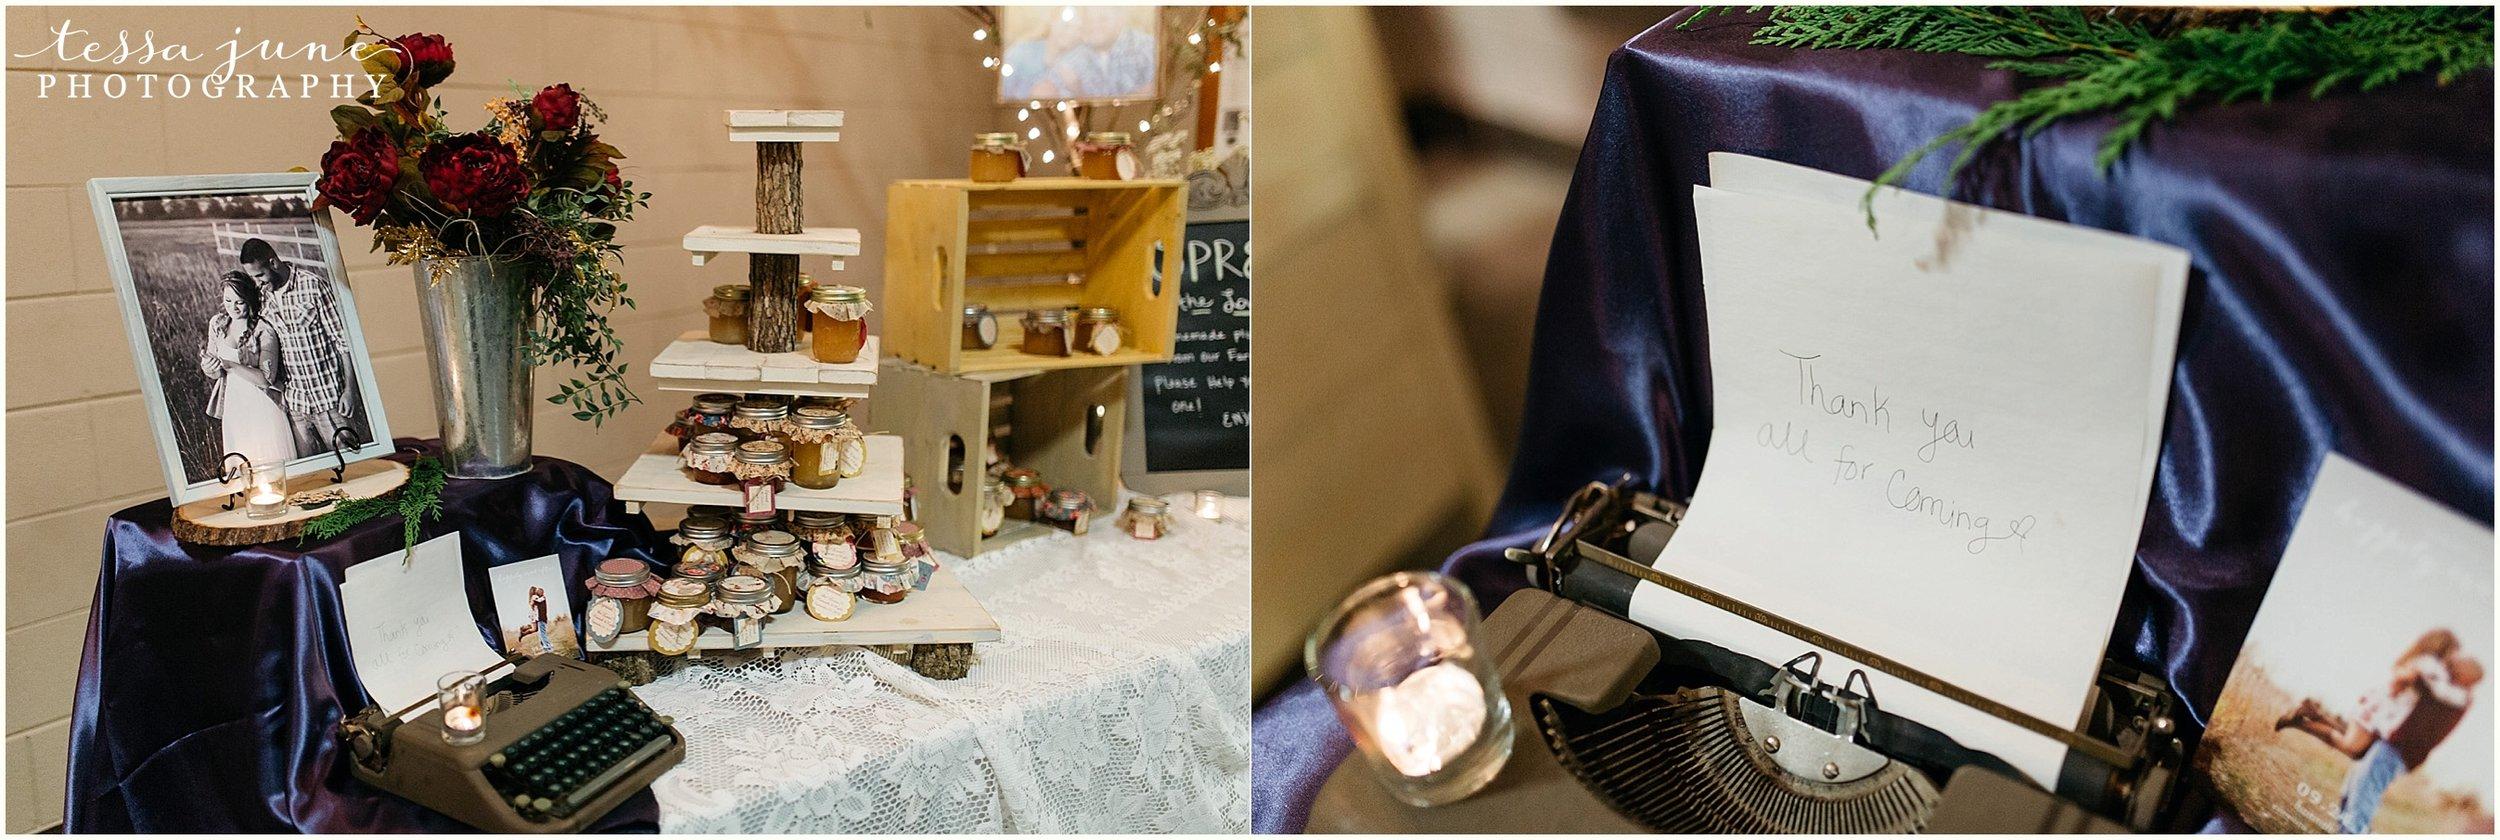 bohemian-minnesota-wedding-mismatched-bridesmaid-dresses-waterfall-st-cloud-tessa-june-photography-146.jpg